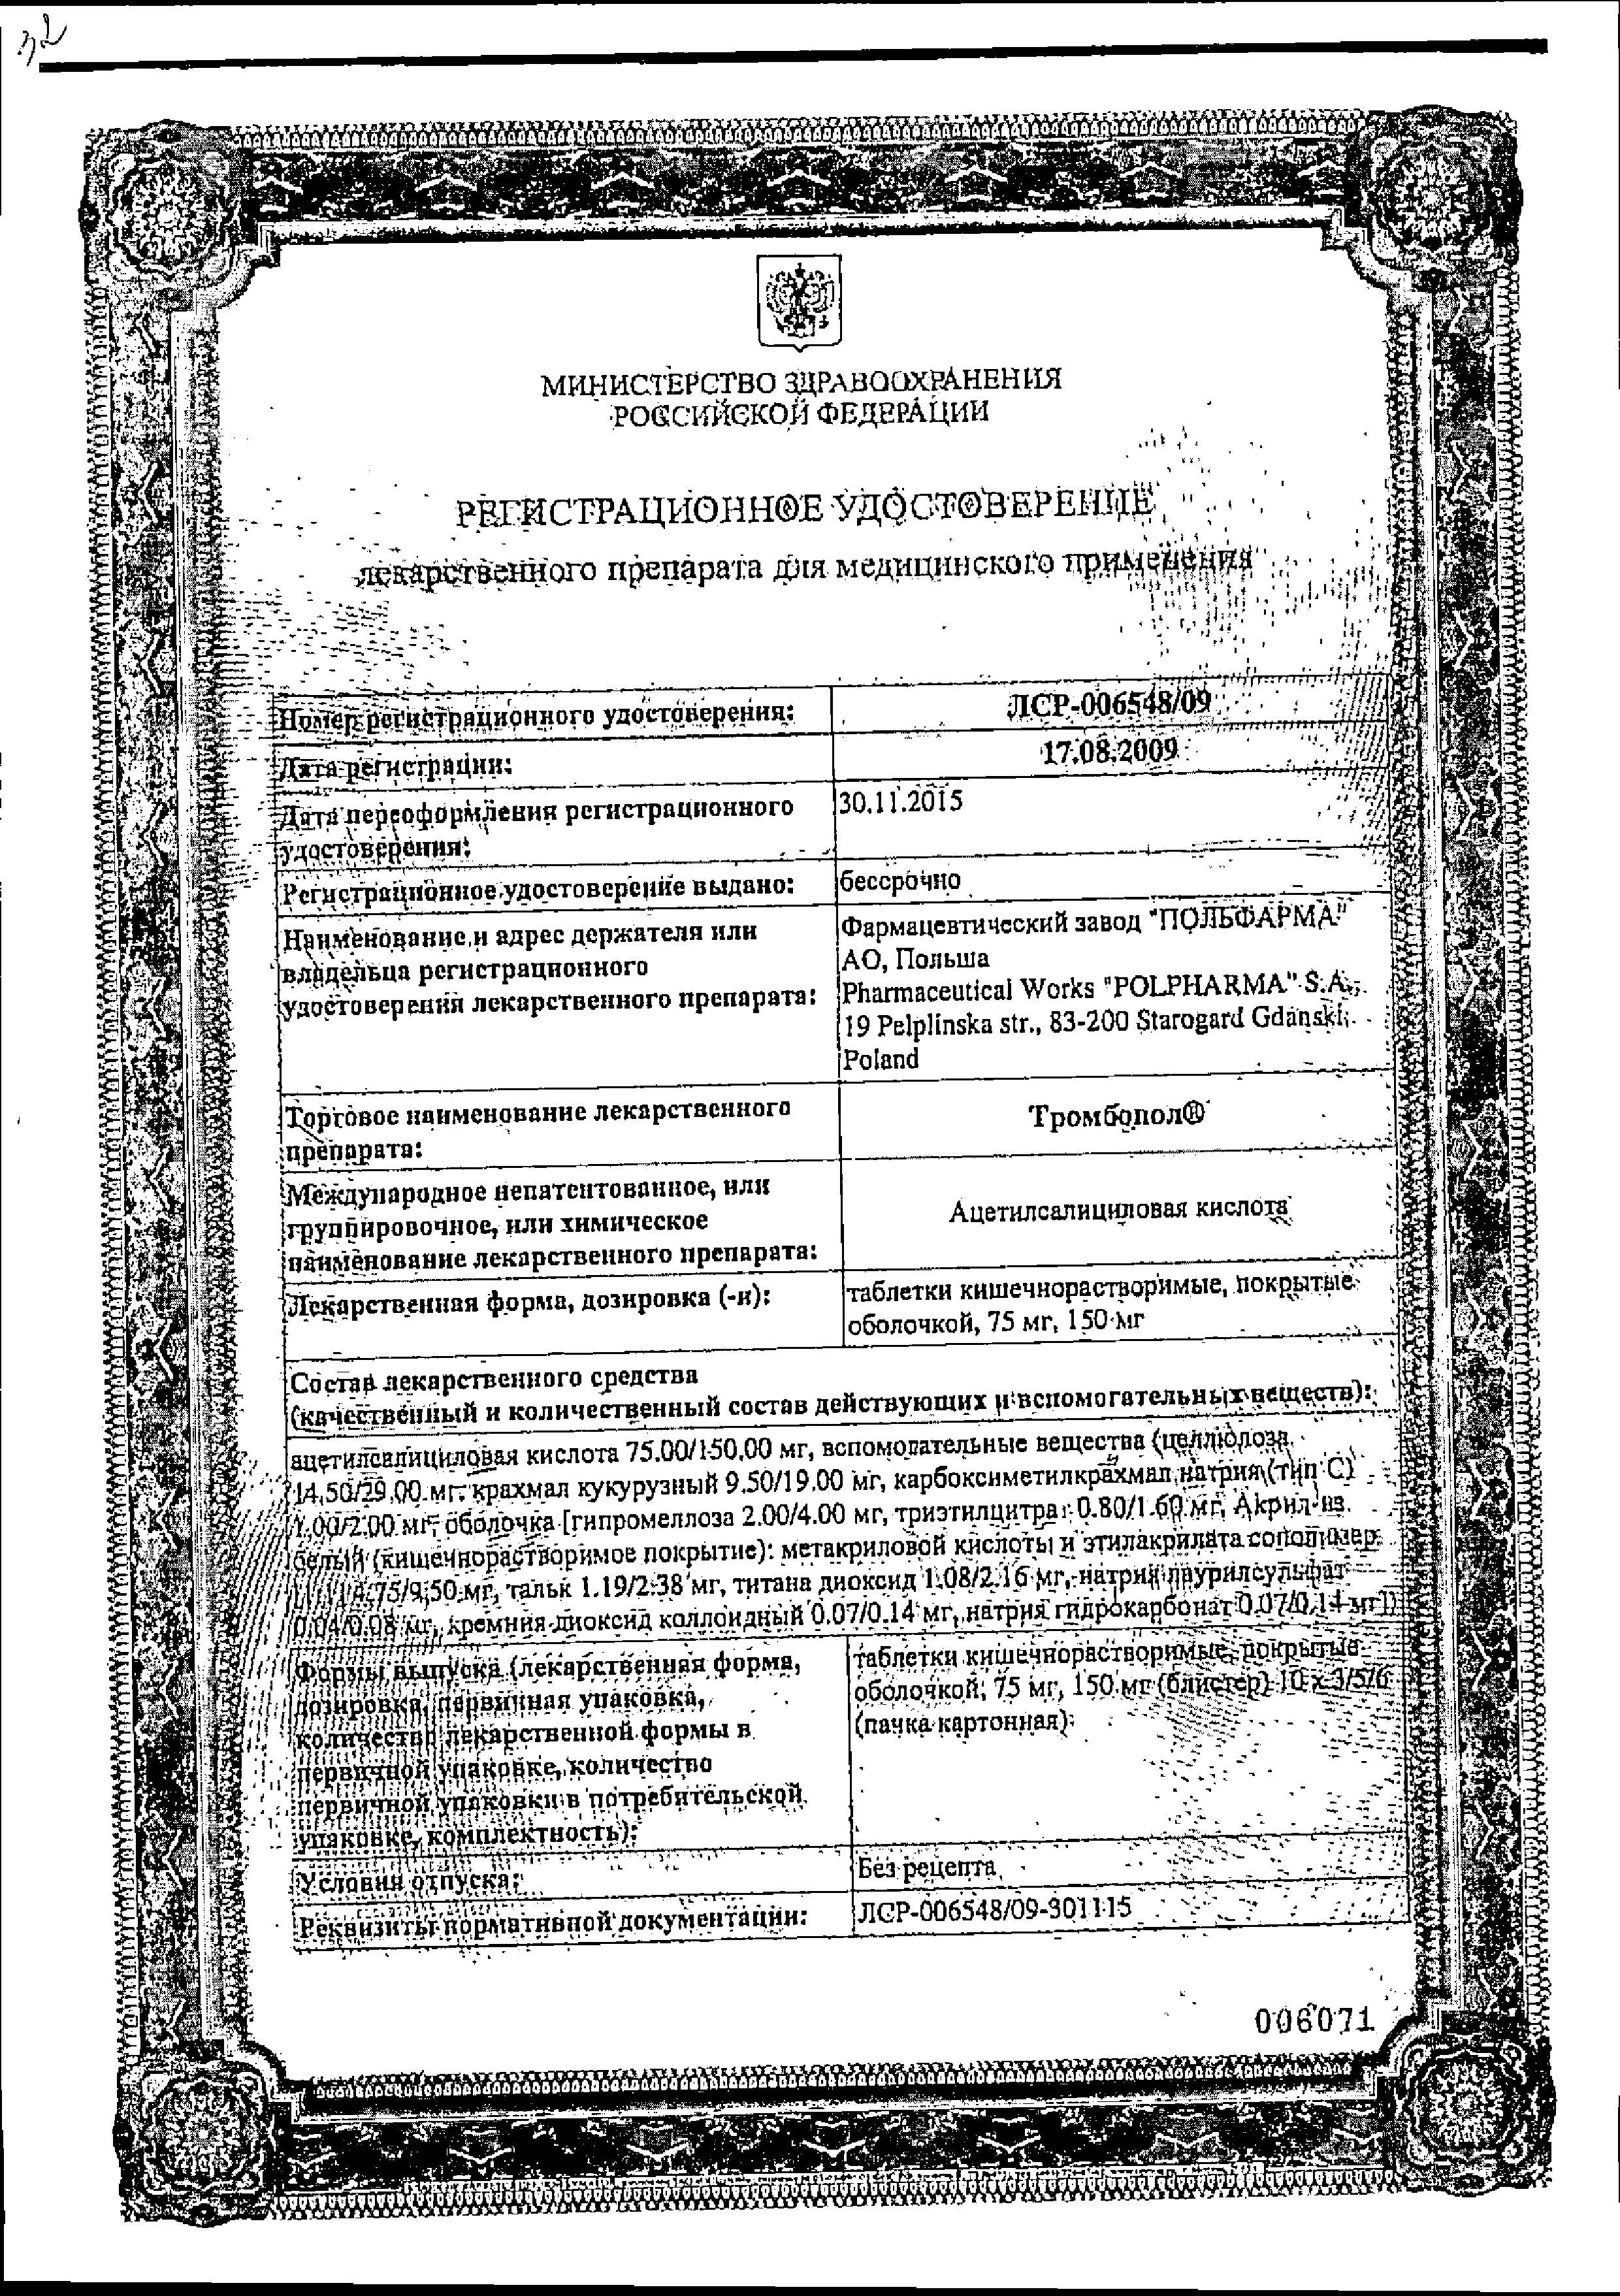 Тромбопол сертификат